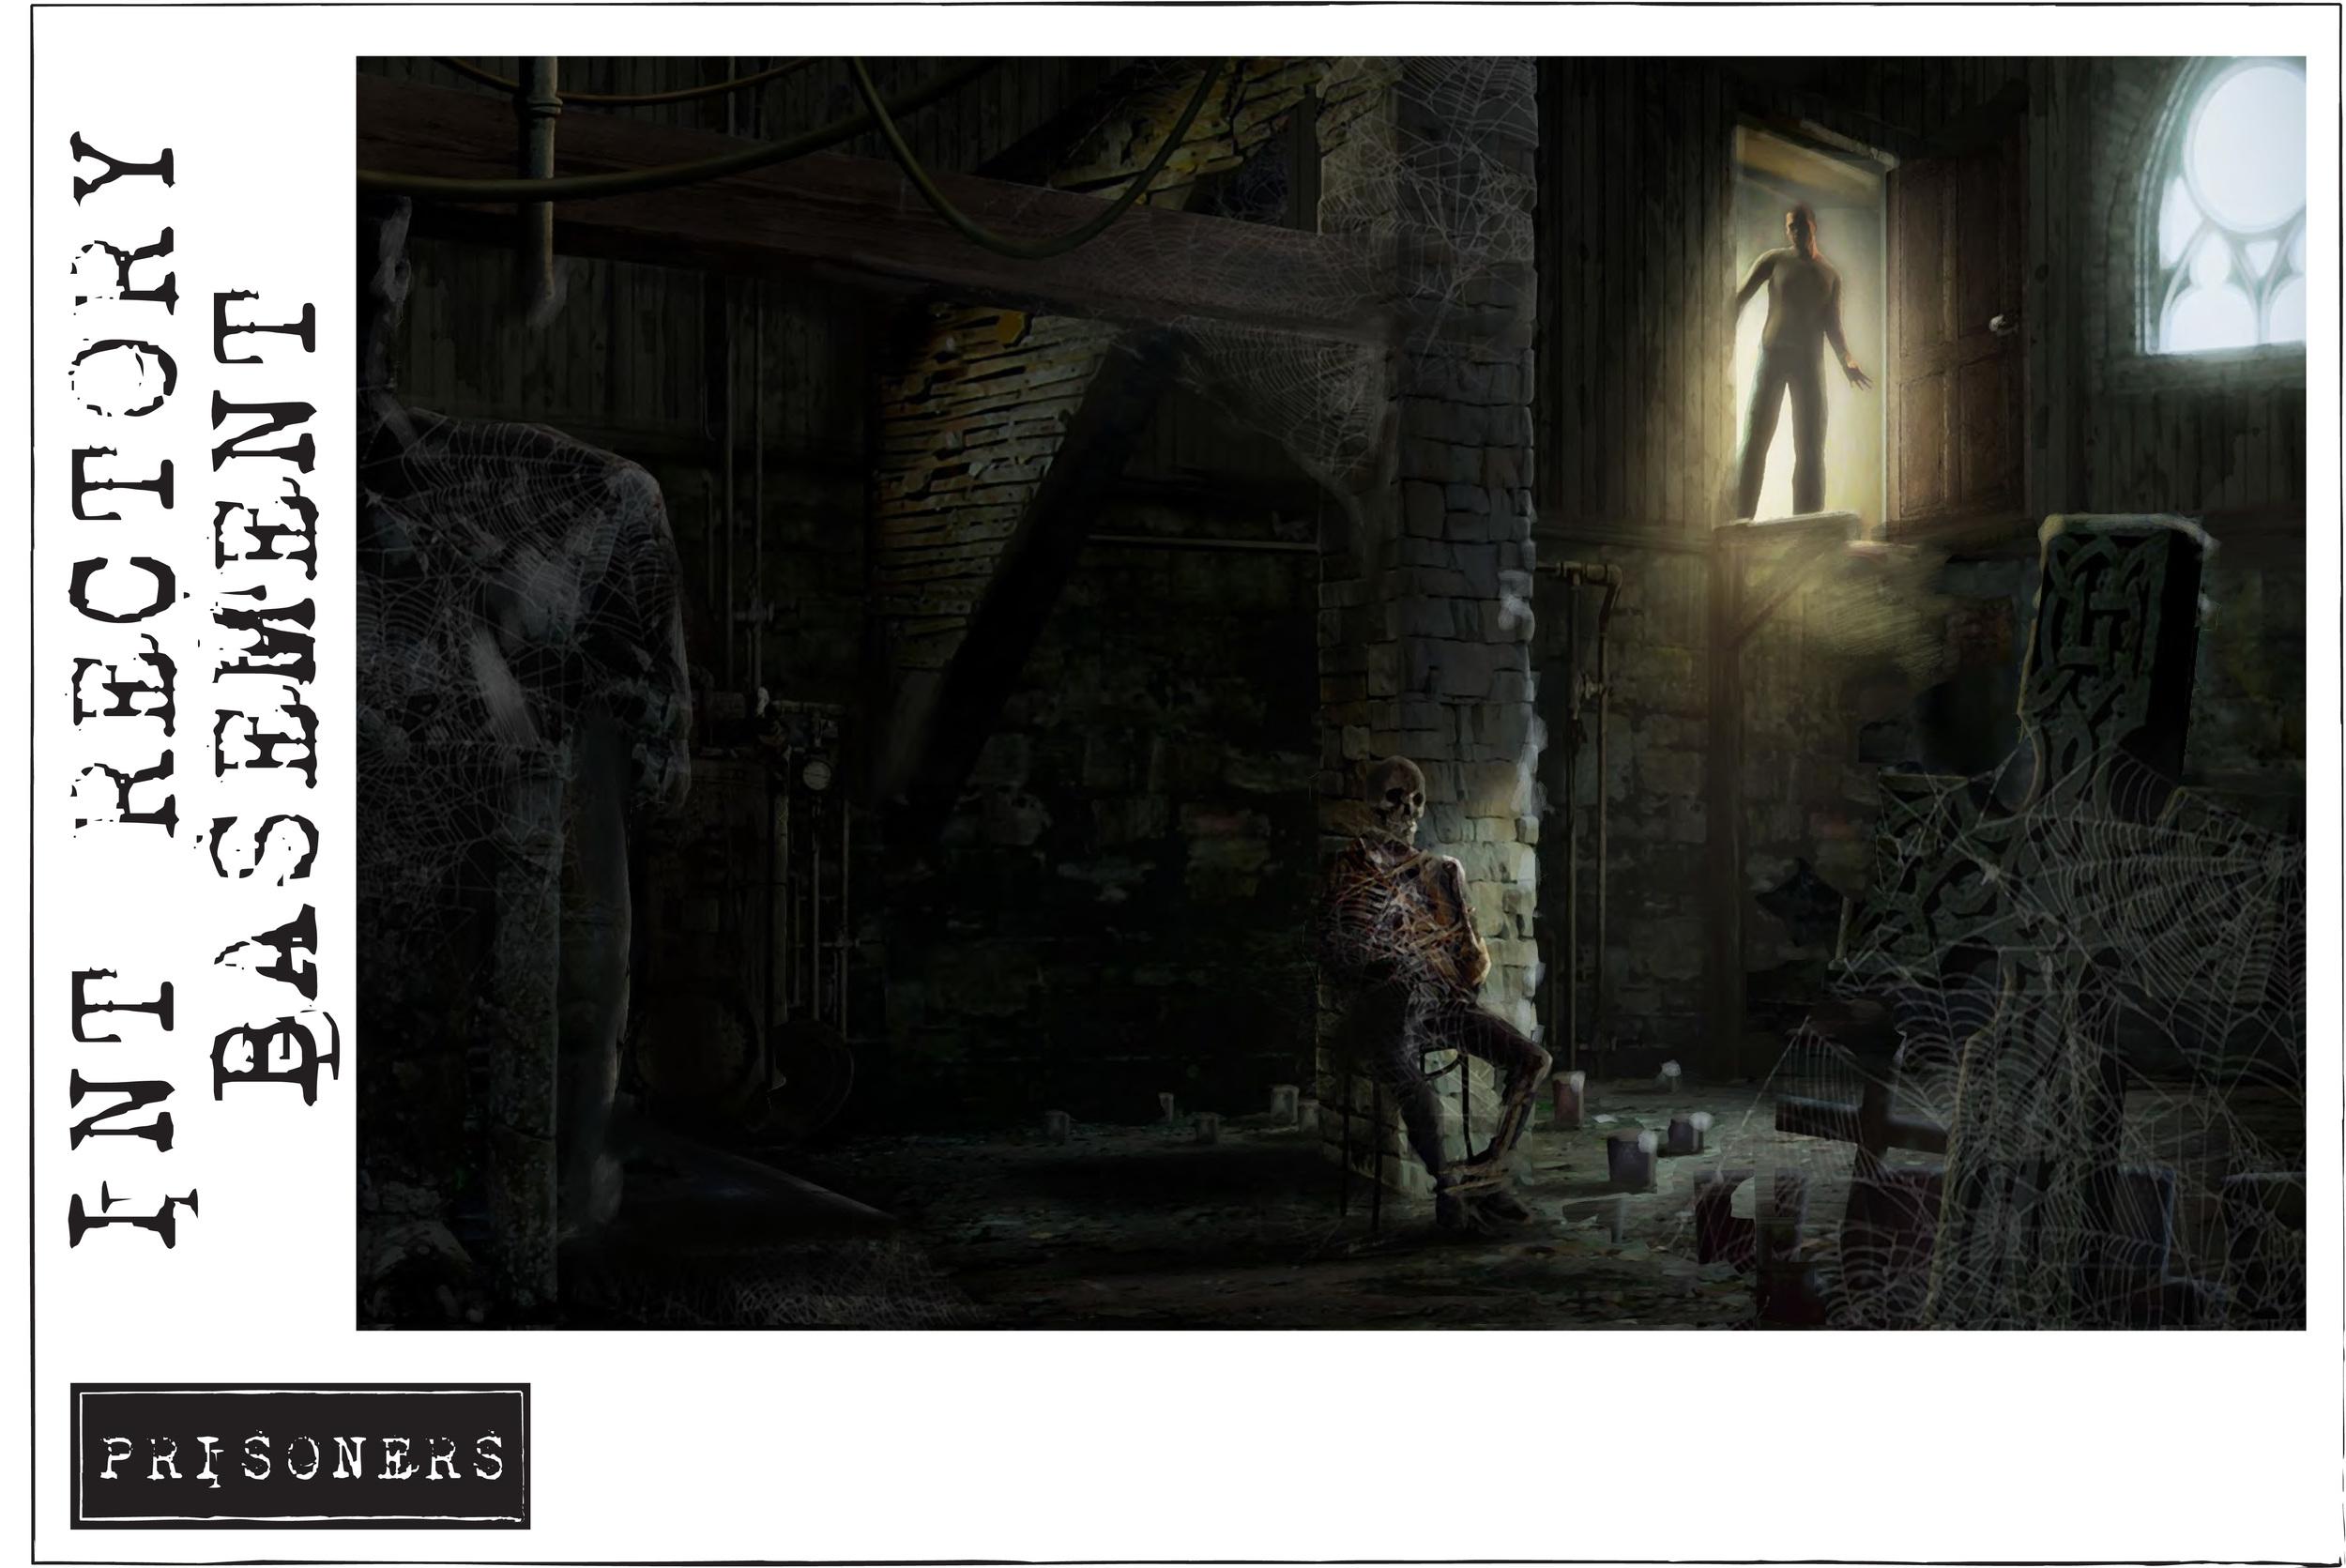 PrisonersPresentation-86.jpg